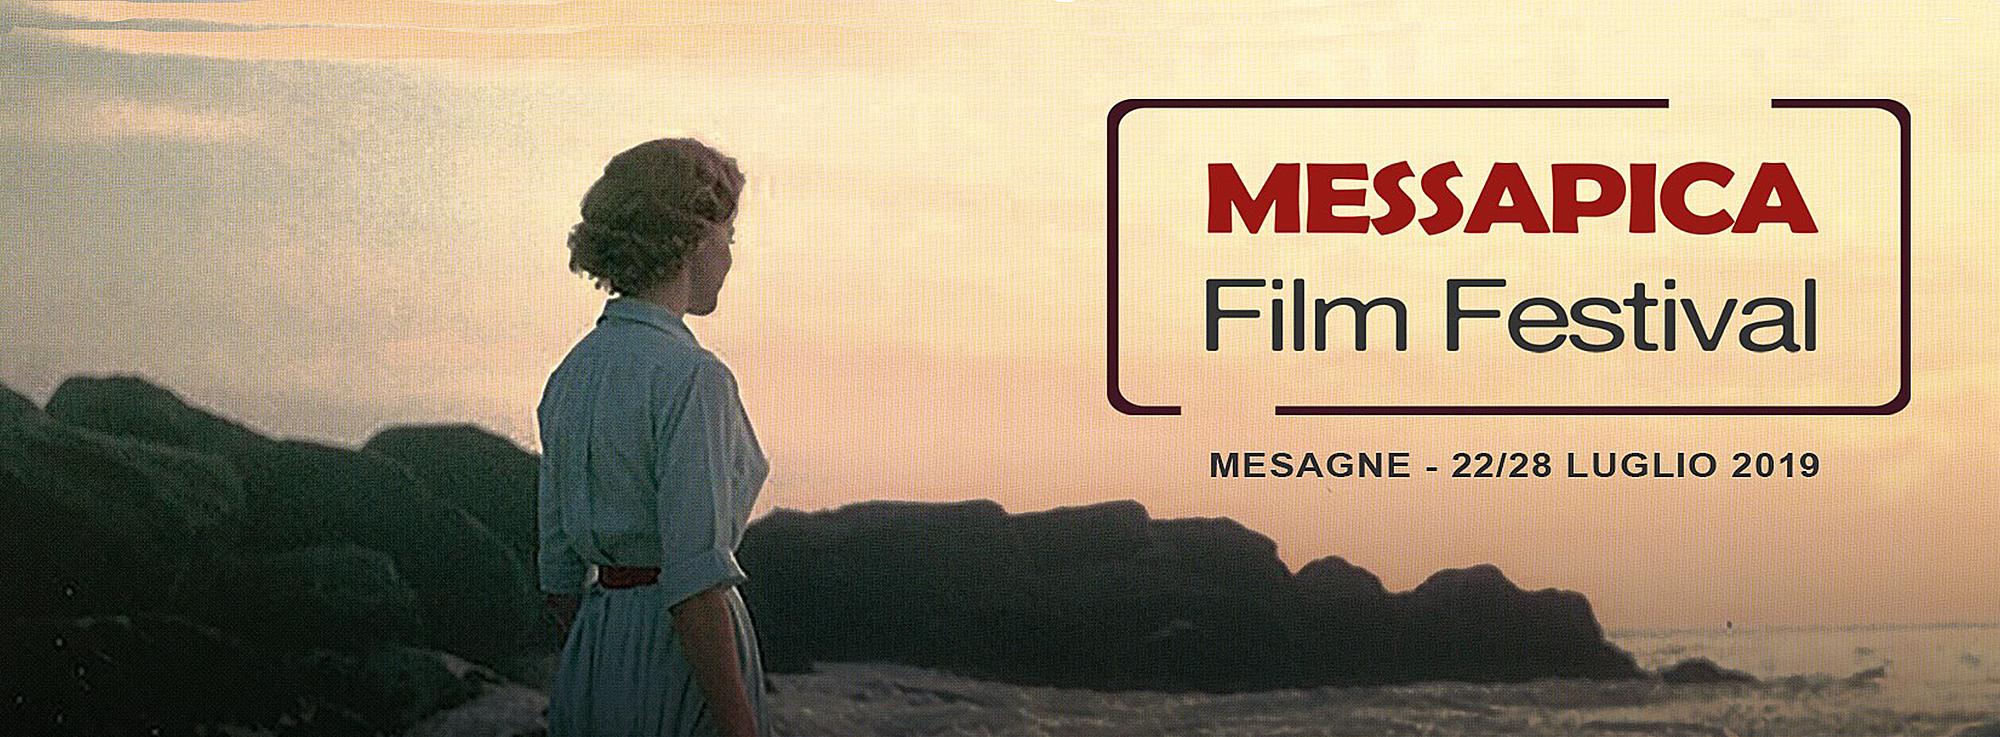 Mesagne: Messapica Film Festival